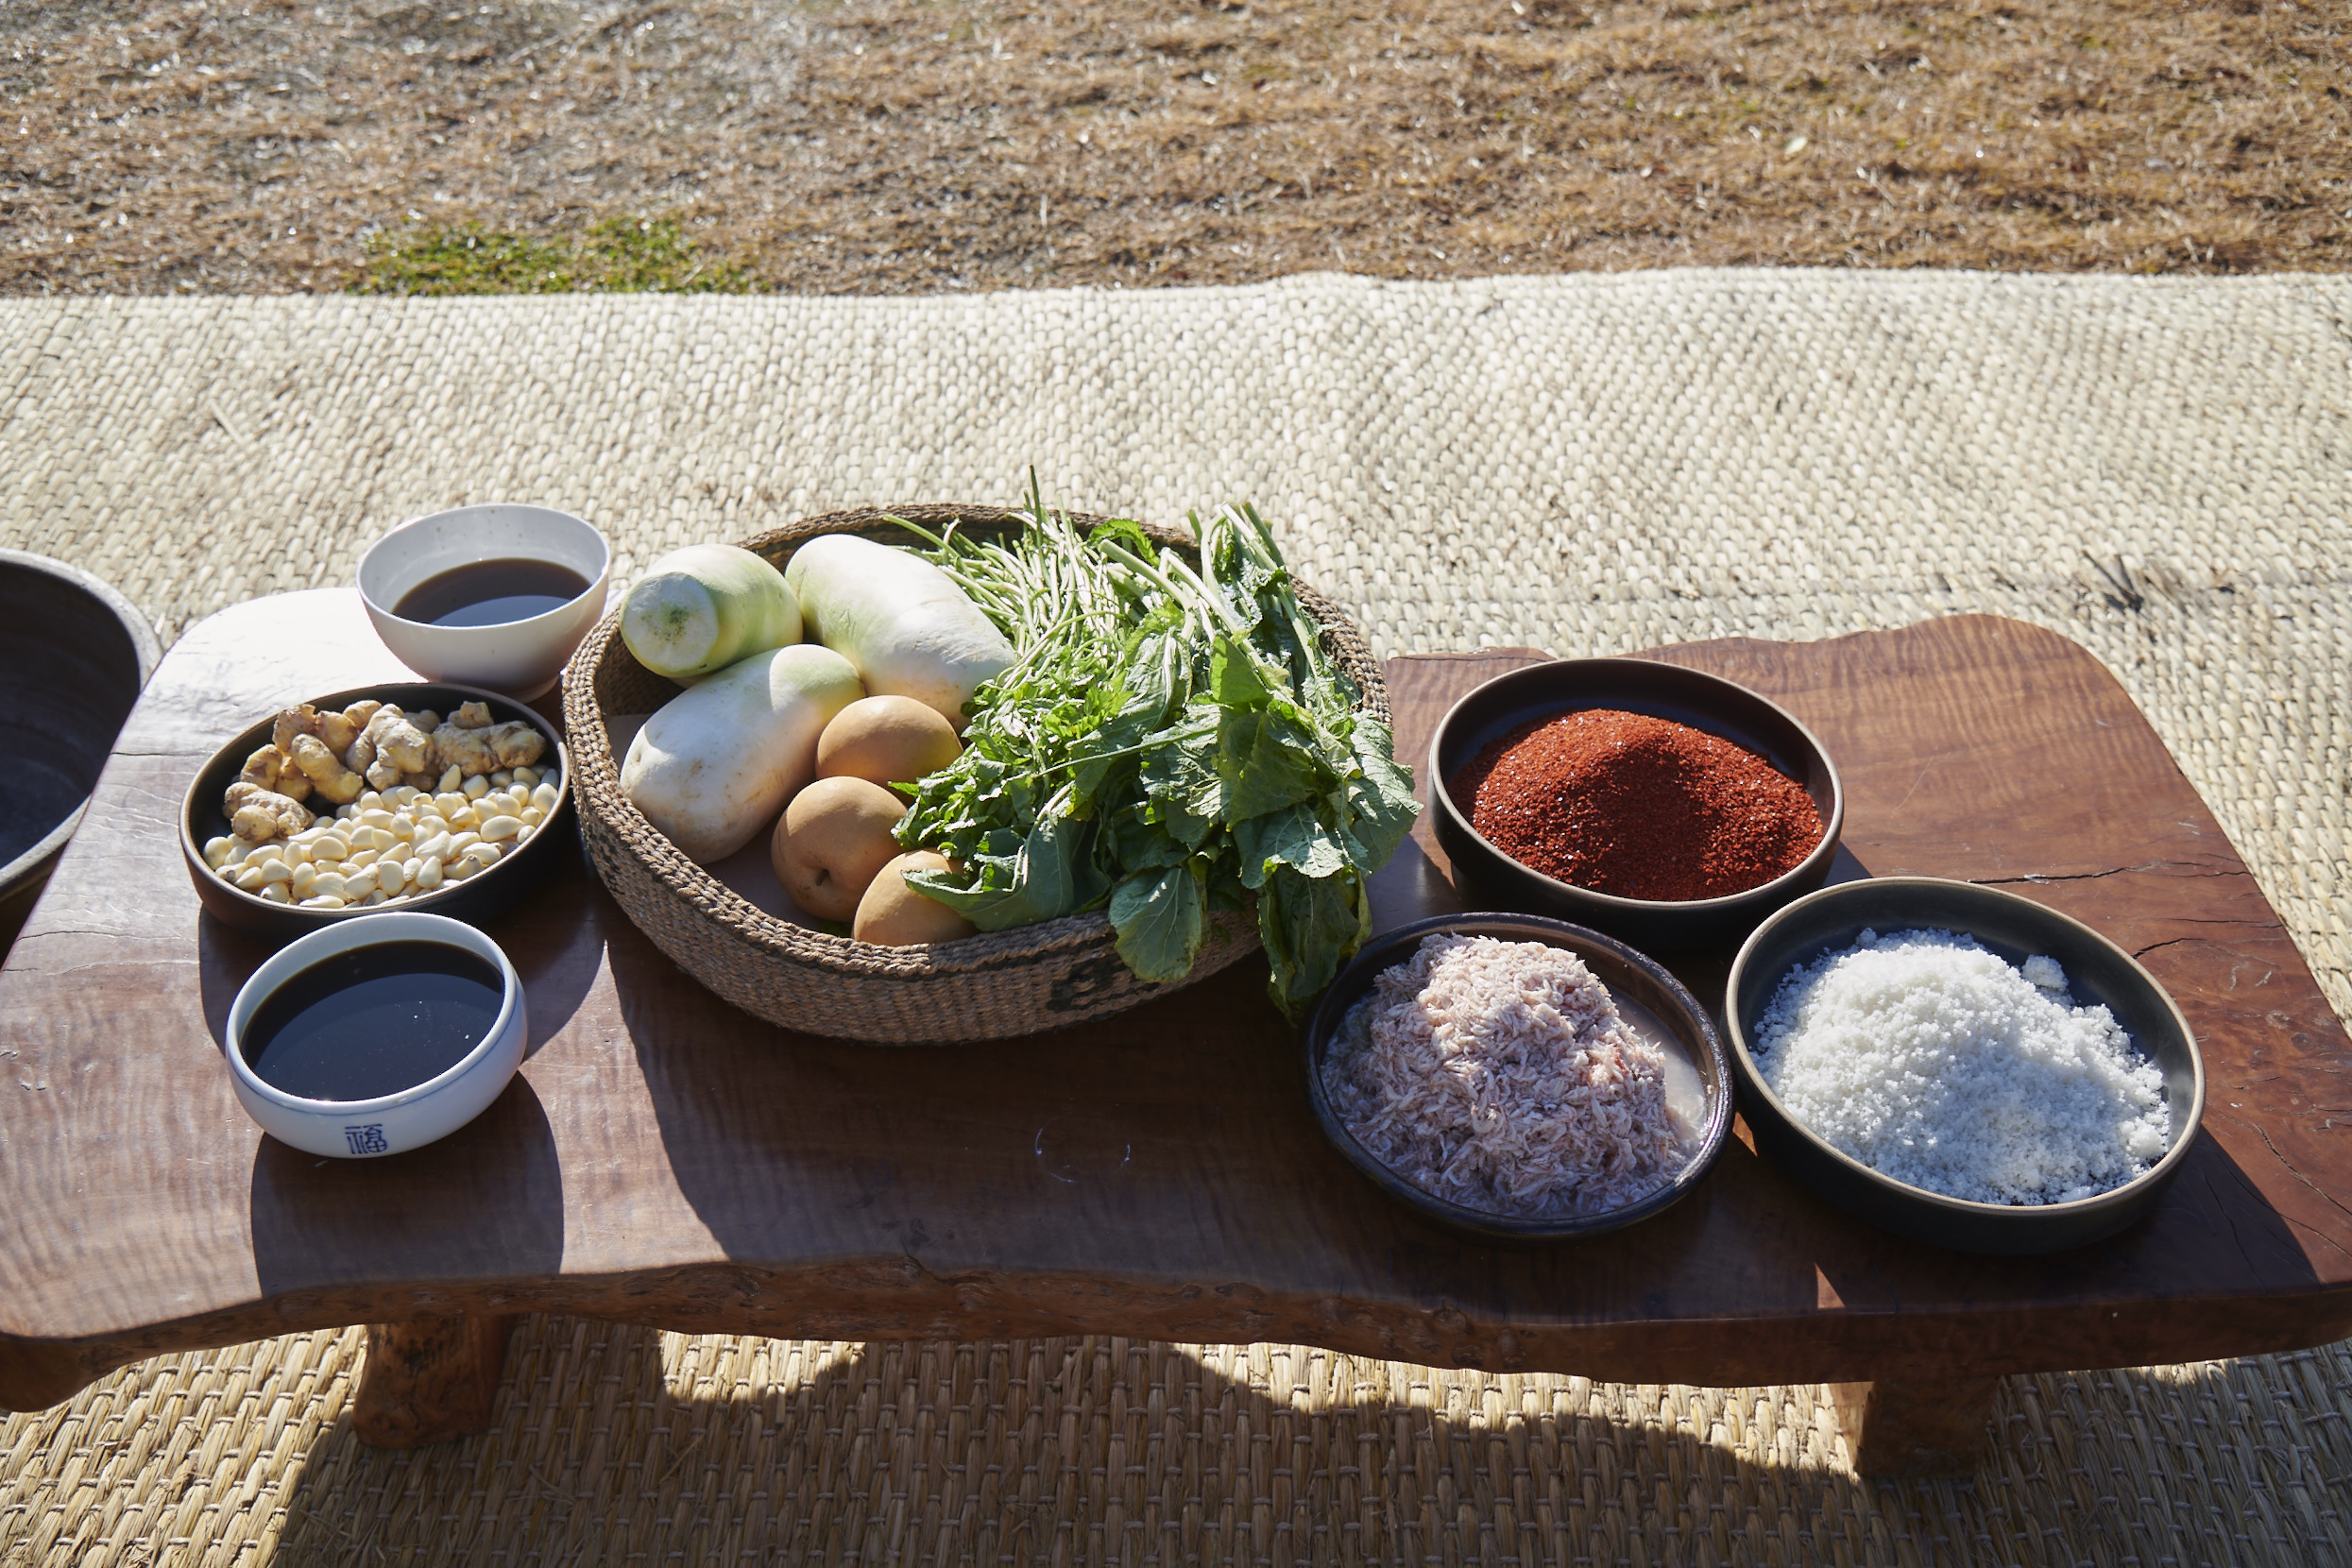 ingredients for making kimchi paste